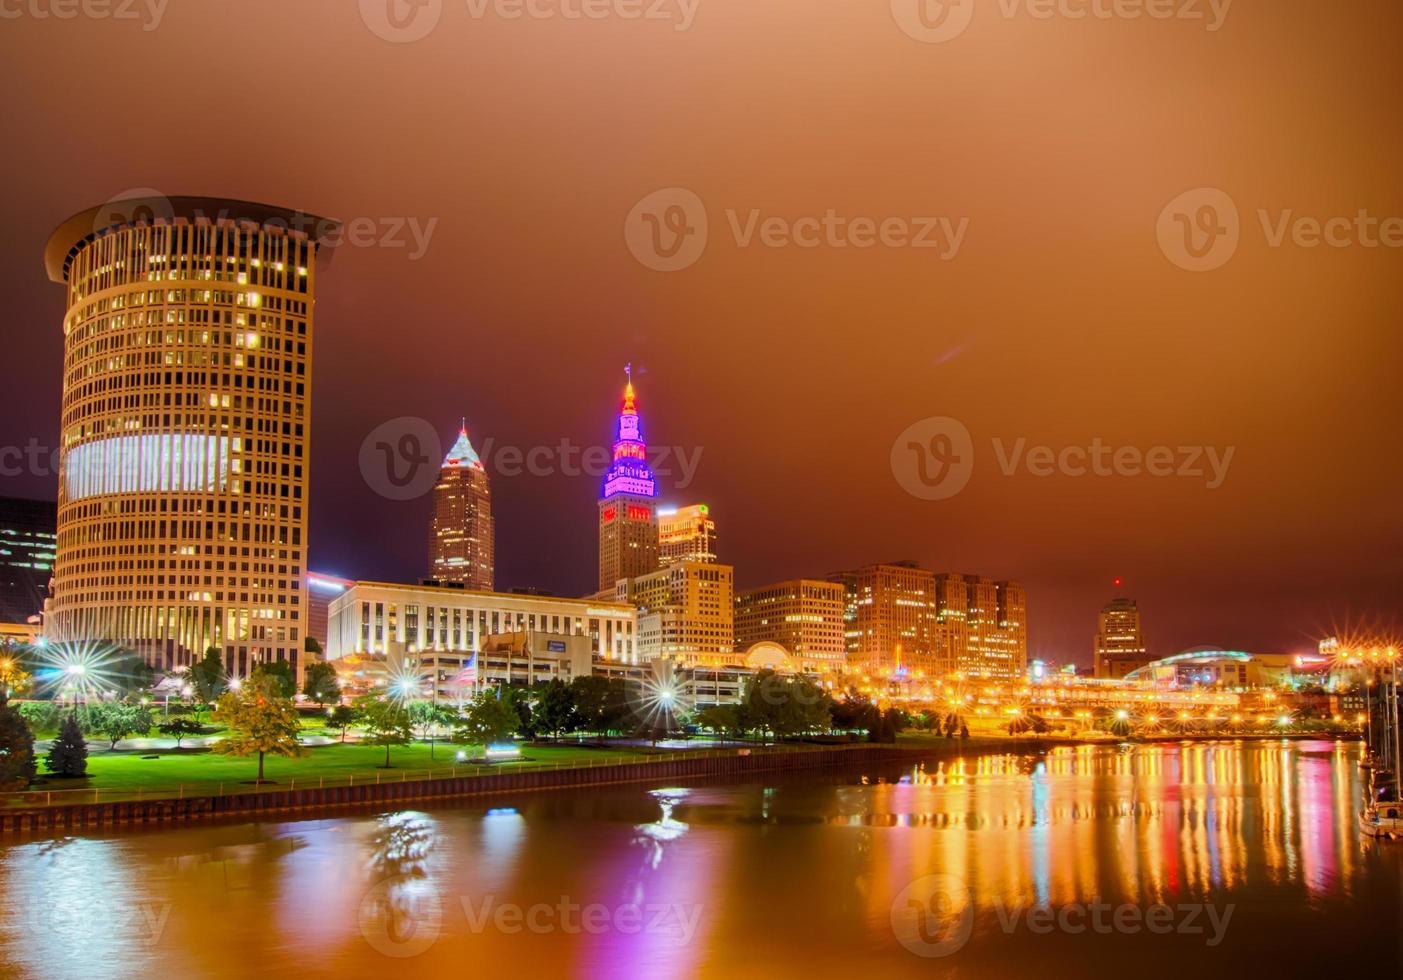 Cleveland. beeld van Cleveland centrum 's nachts foto